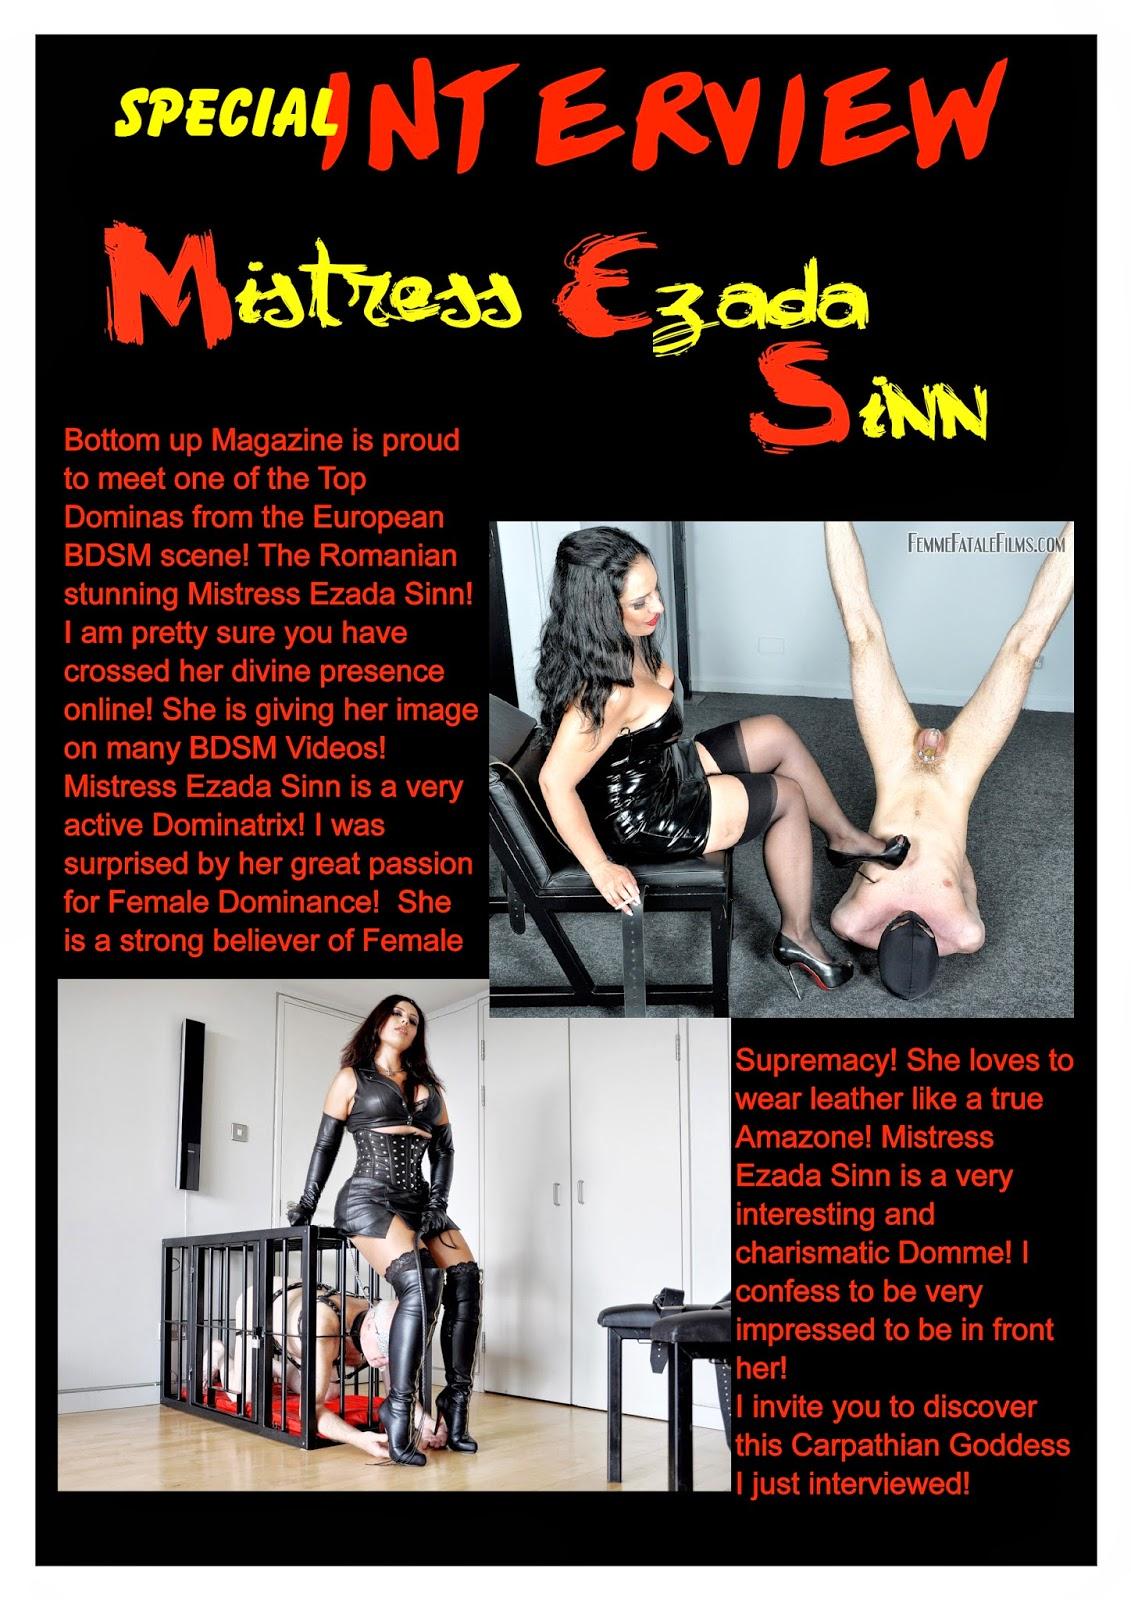 http://bottomupmag.blogspot.com/p/featuring-mistress.html